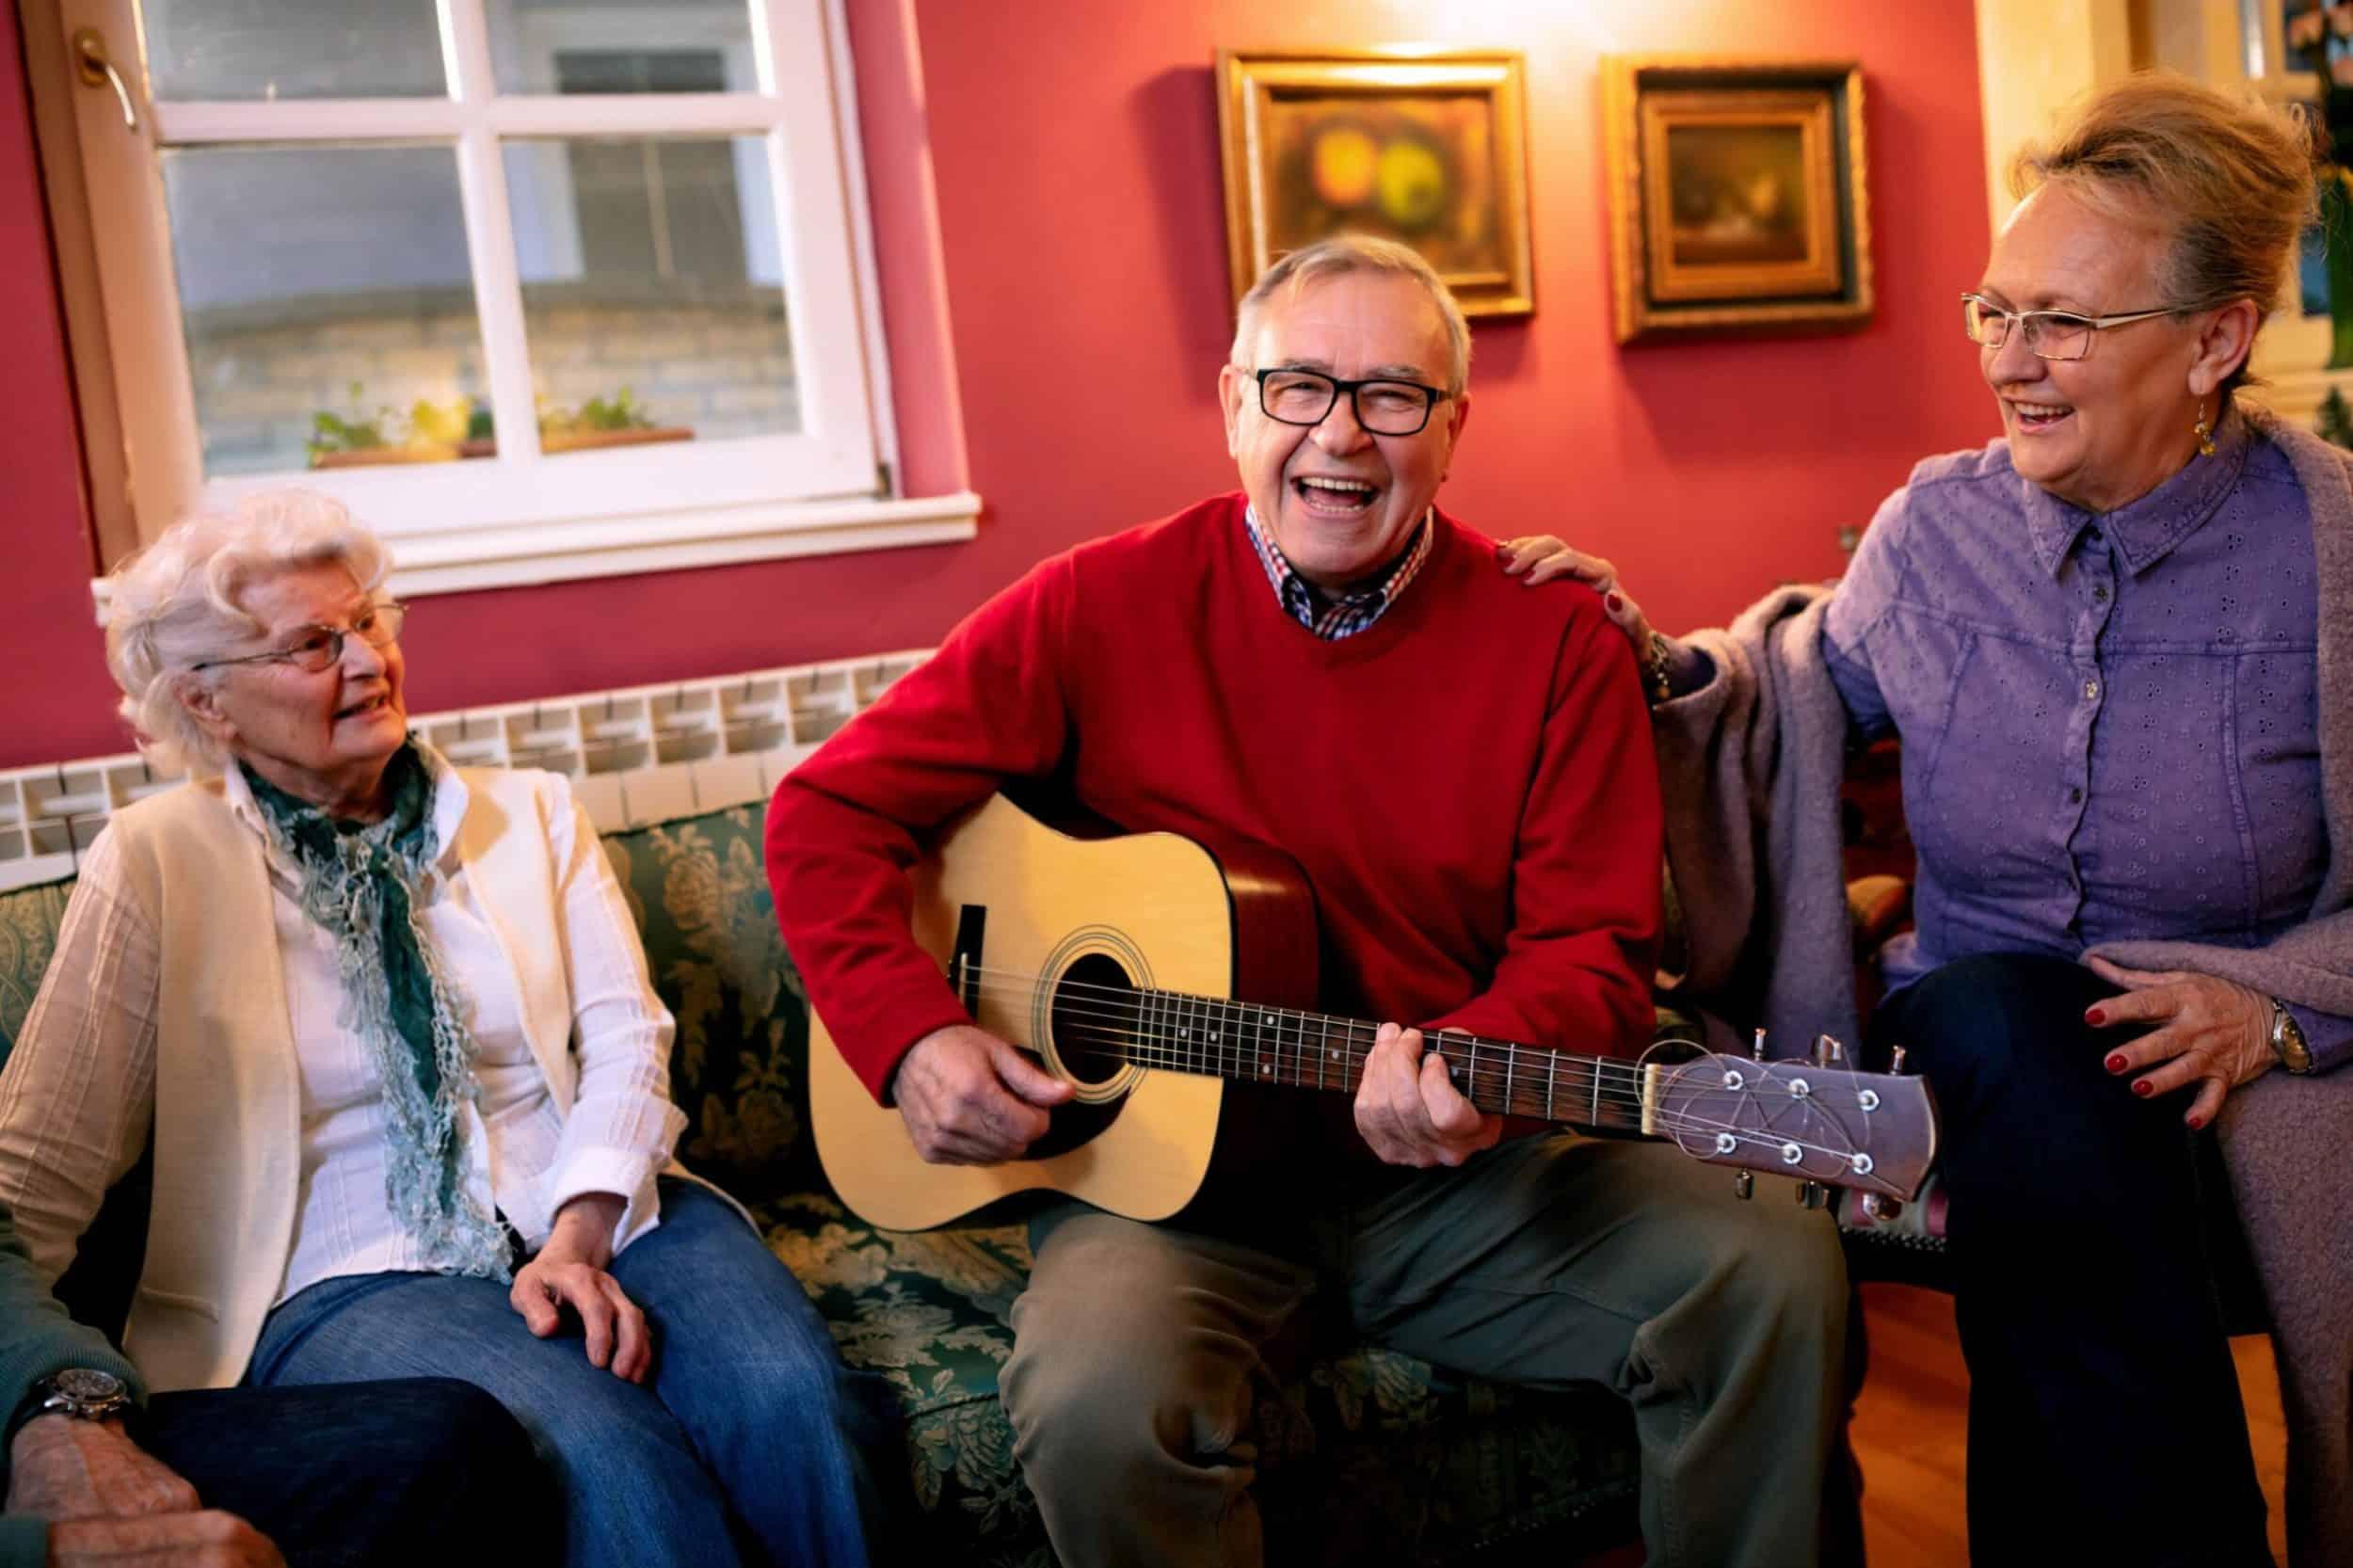 3 People playing music